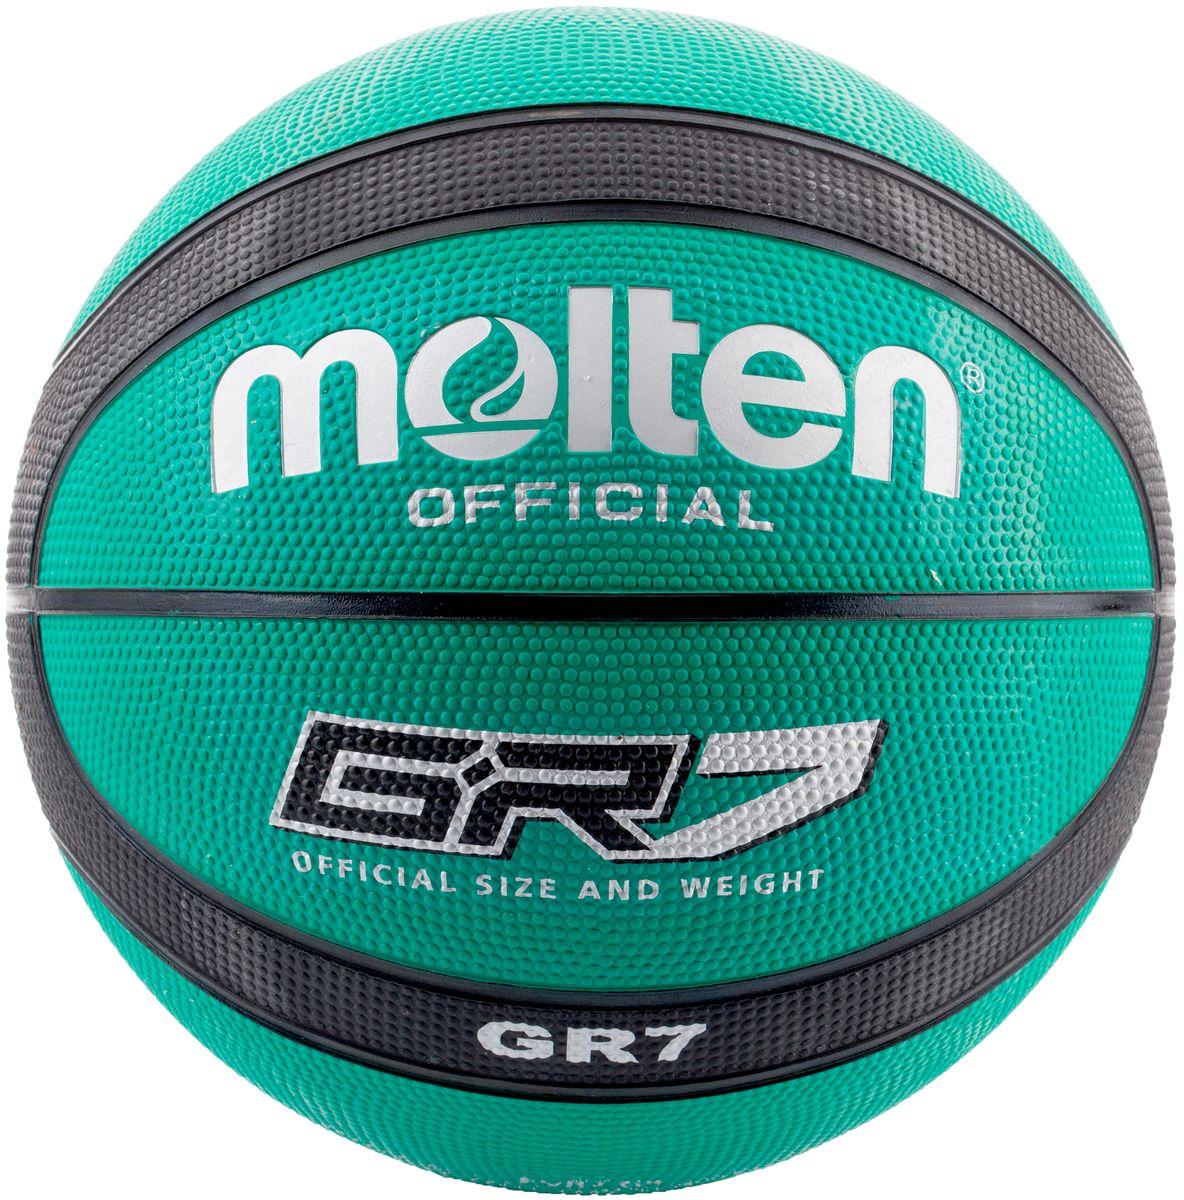 Мяч баскетбольный Molten. Размер 7. BGR7-GK баскетбольный мяч molten gm7 pu